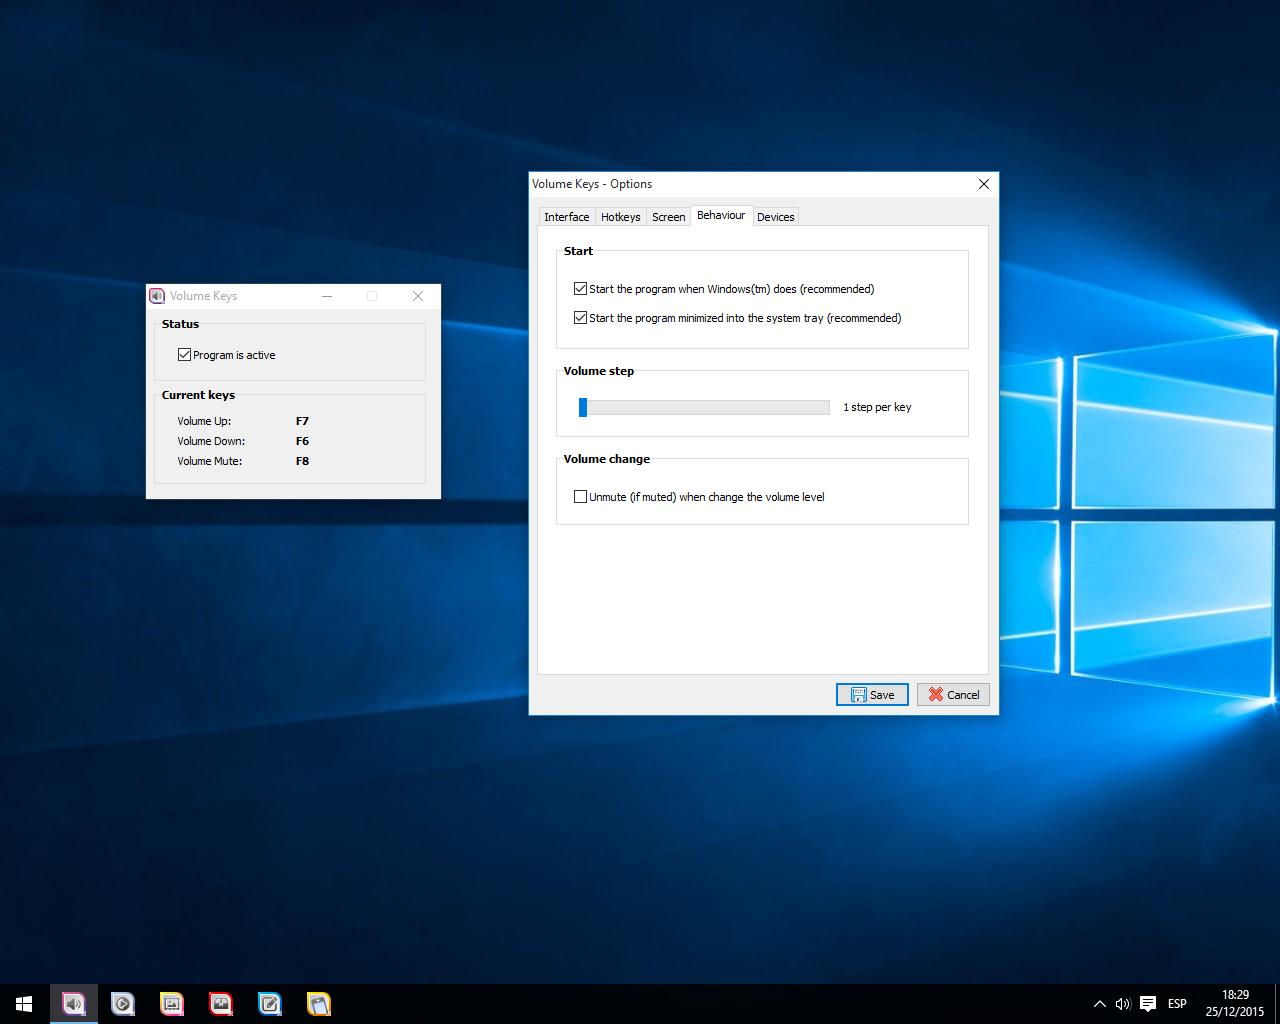 Get Volume Keys to Adjust Computer Volume Using Hotkeys